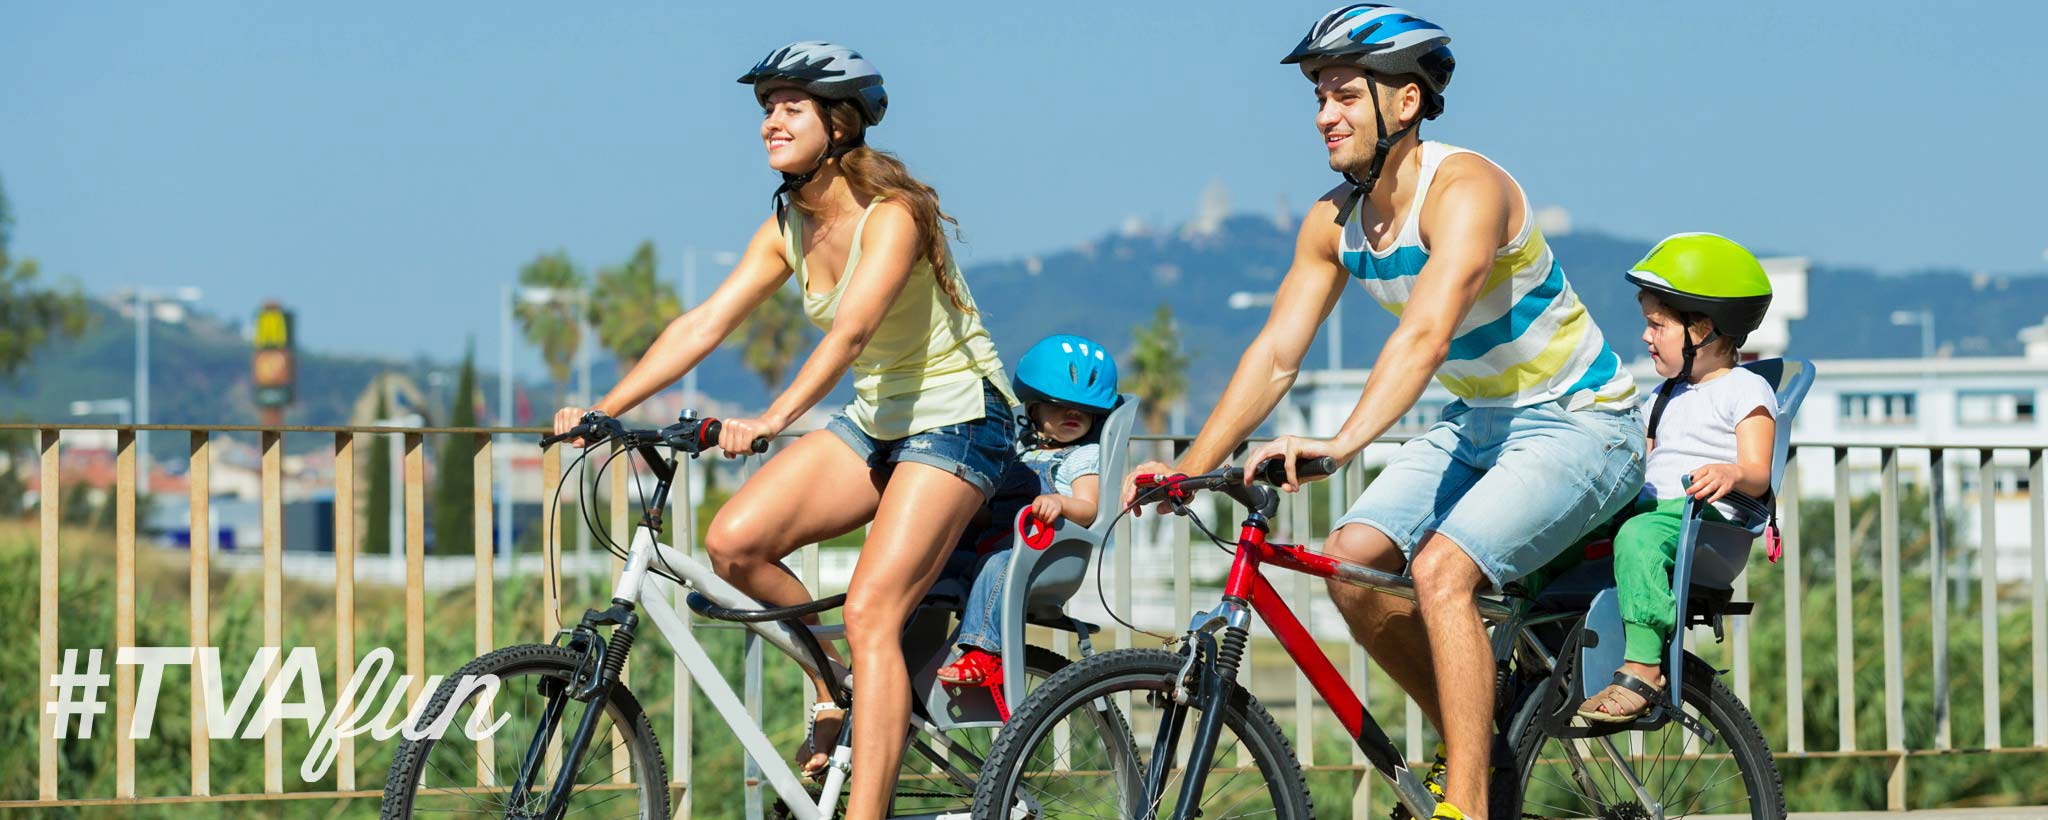 Biking the Greenway